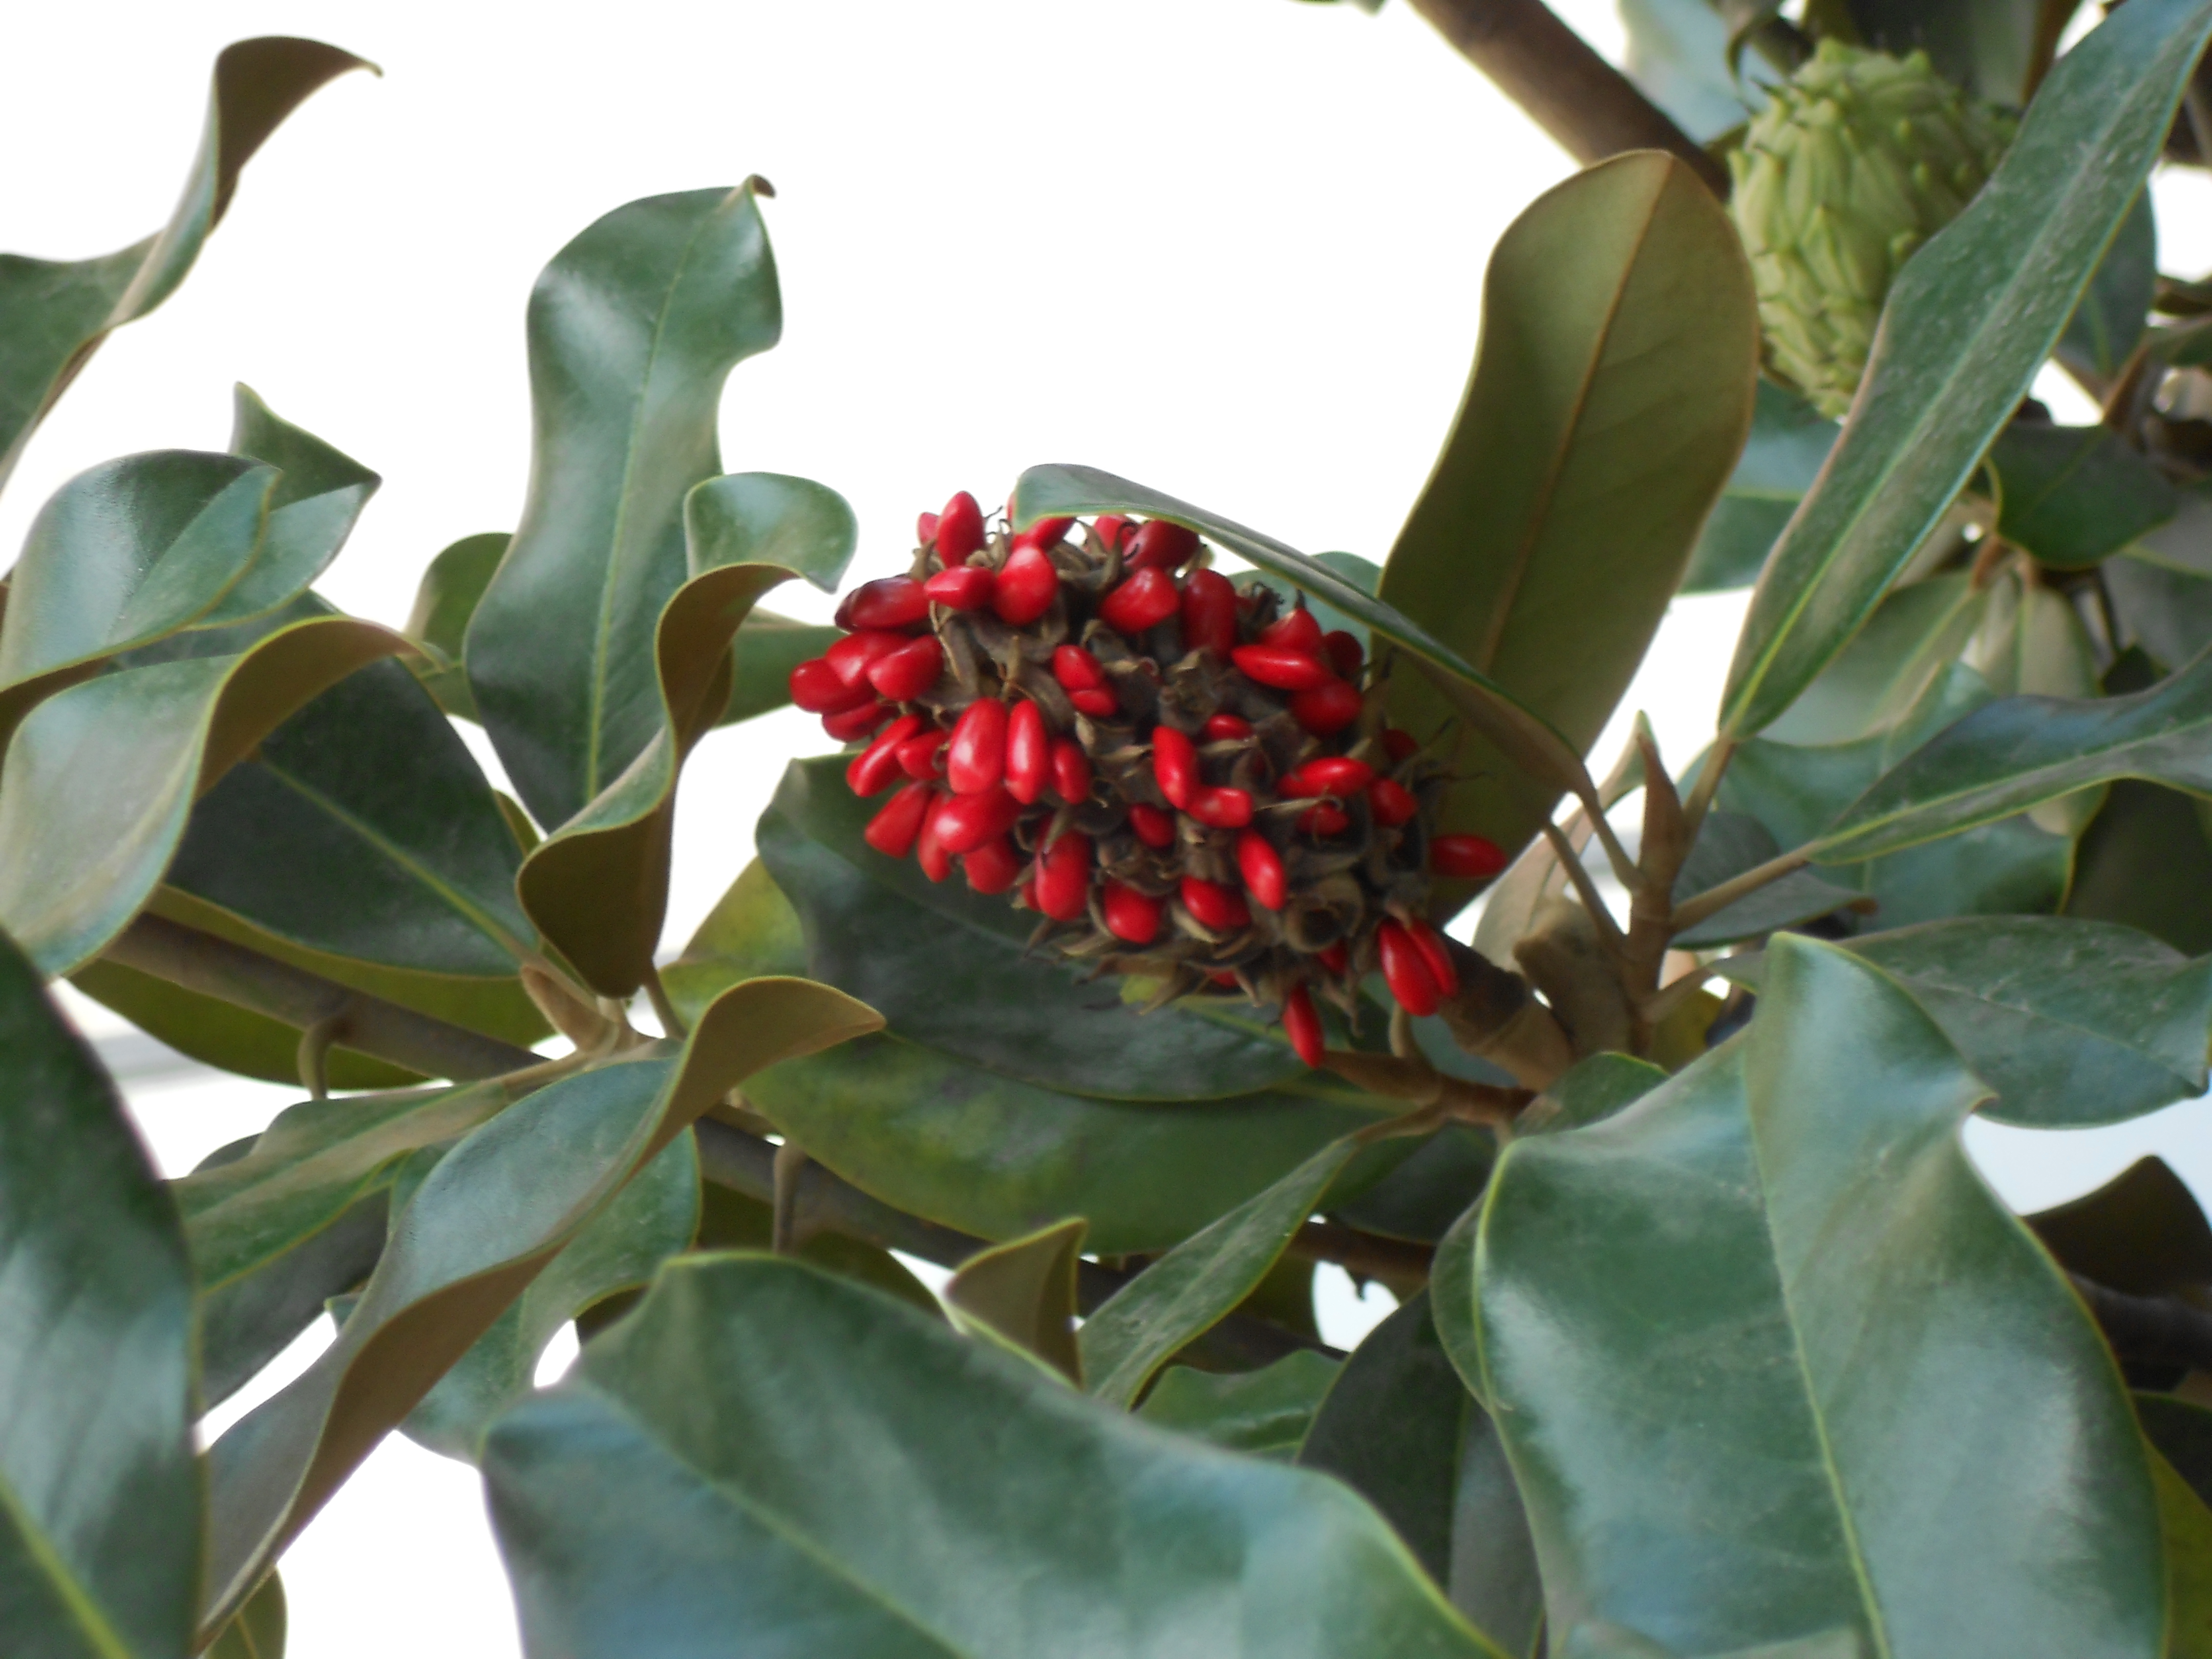 Filemagnolia Fruit South Americajpg Wikimedia Commons